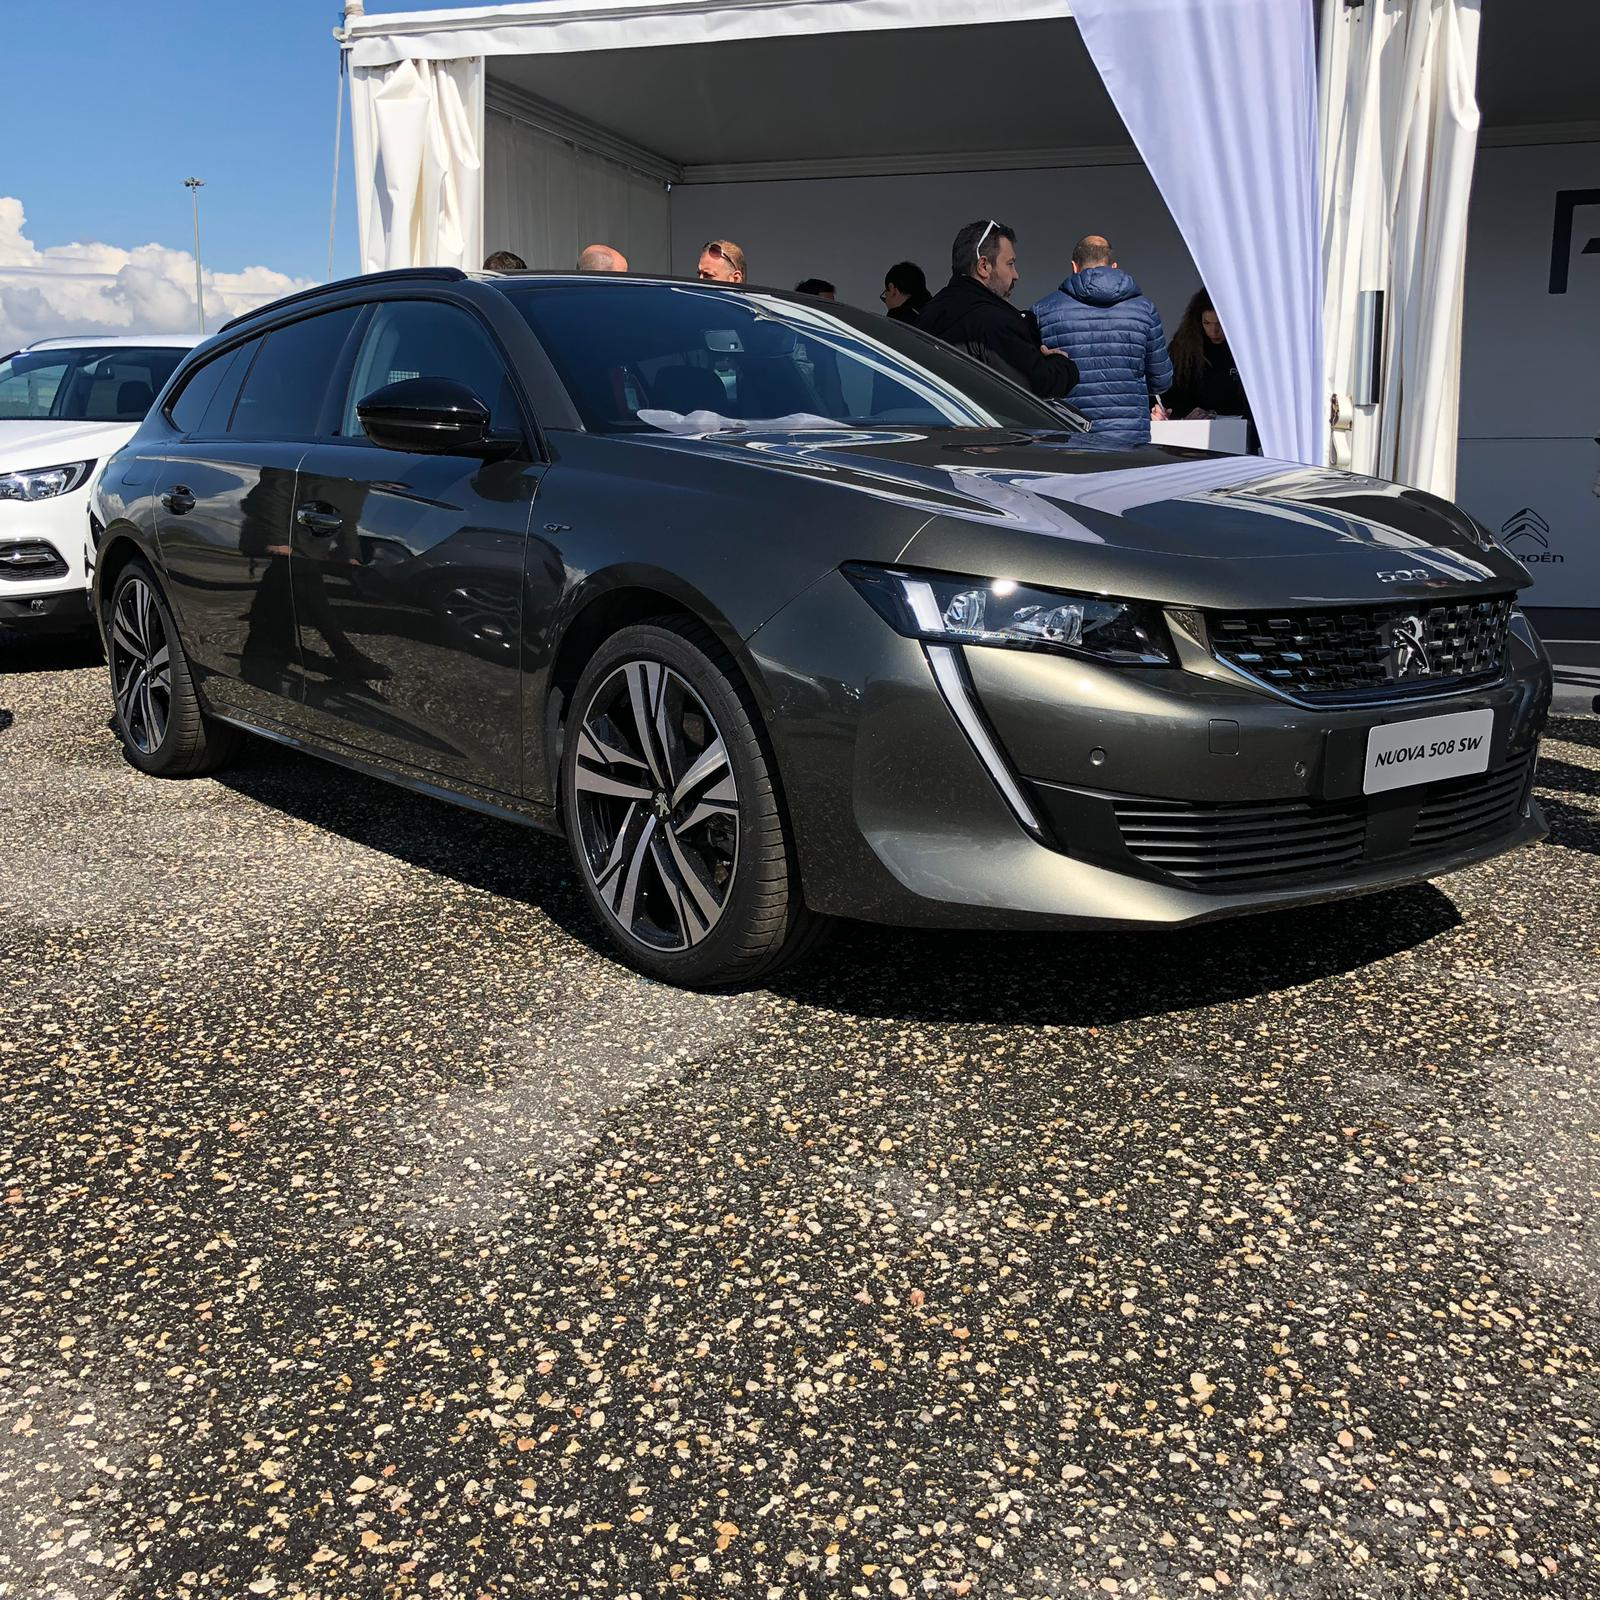 peugeot-508-sw-anteprima-fleet-motor-day-2019